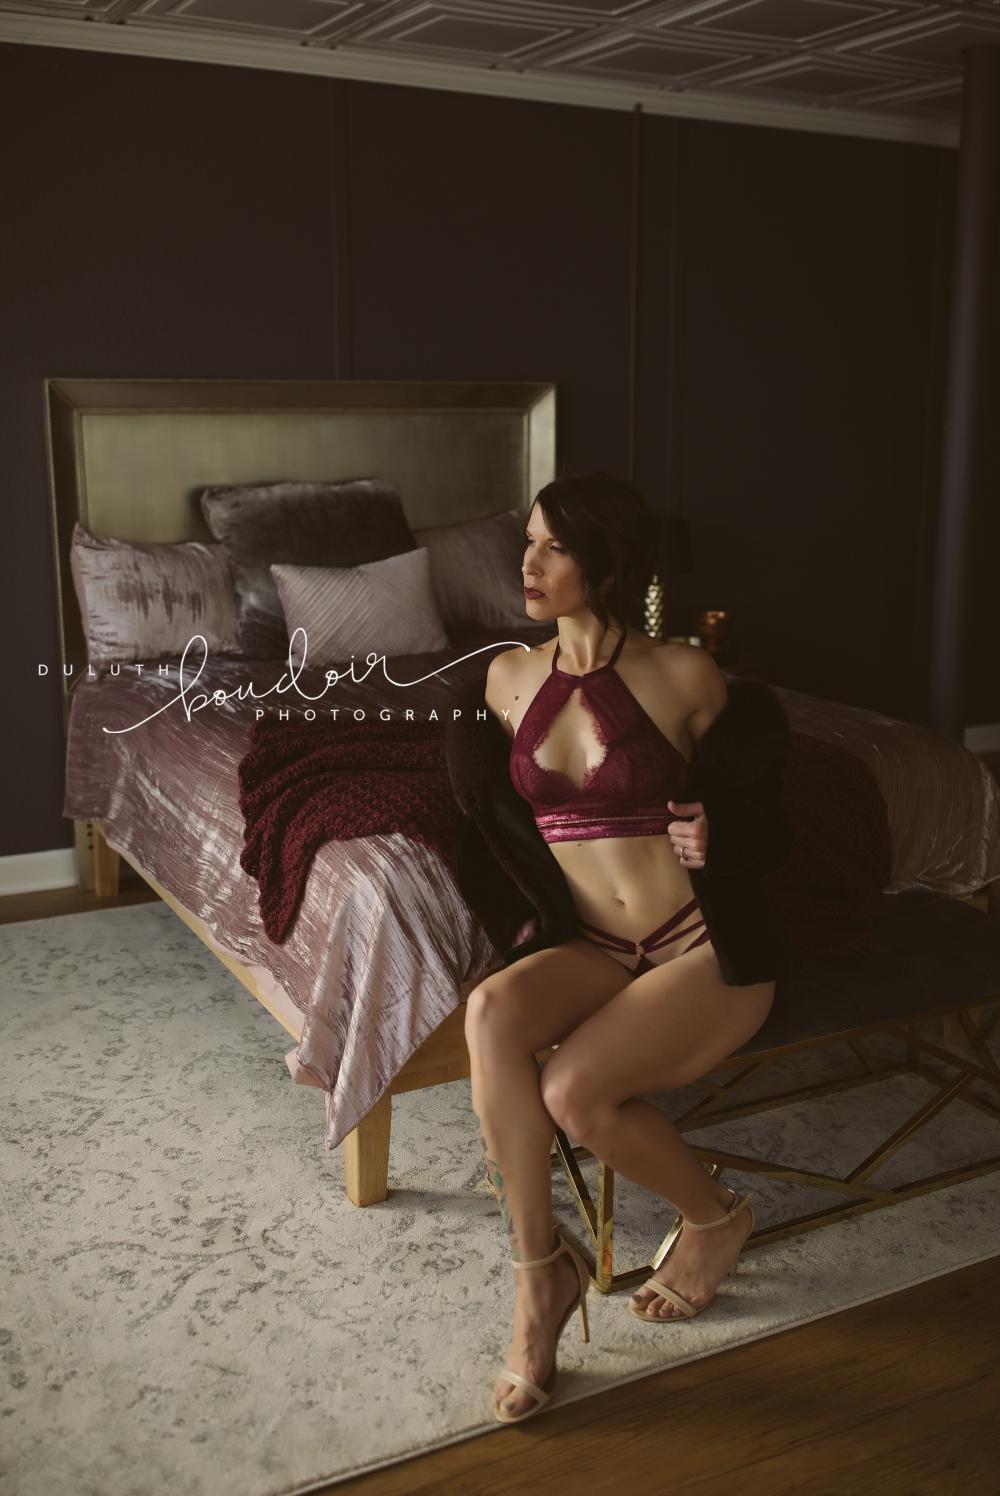 duluth_boudoir_photography_amity_40